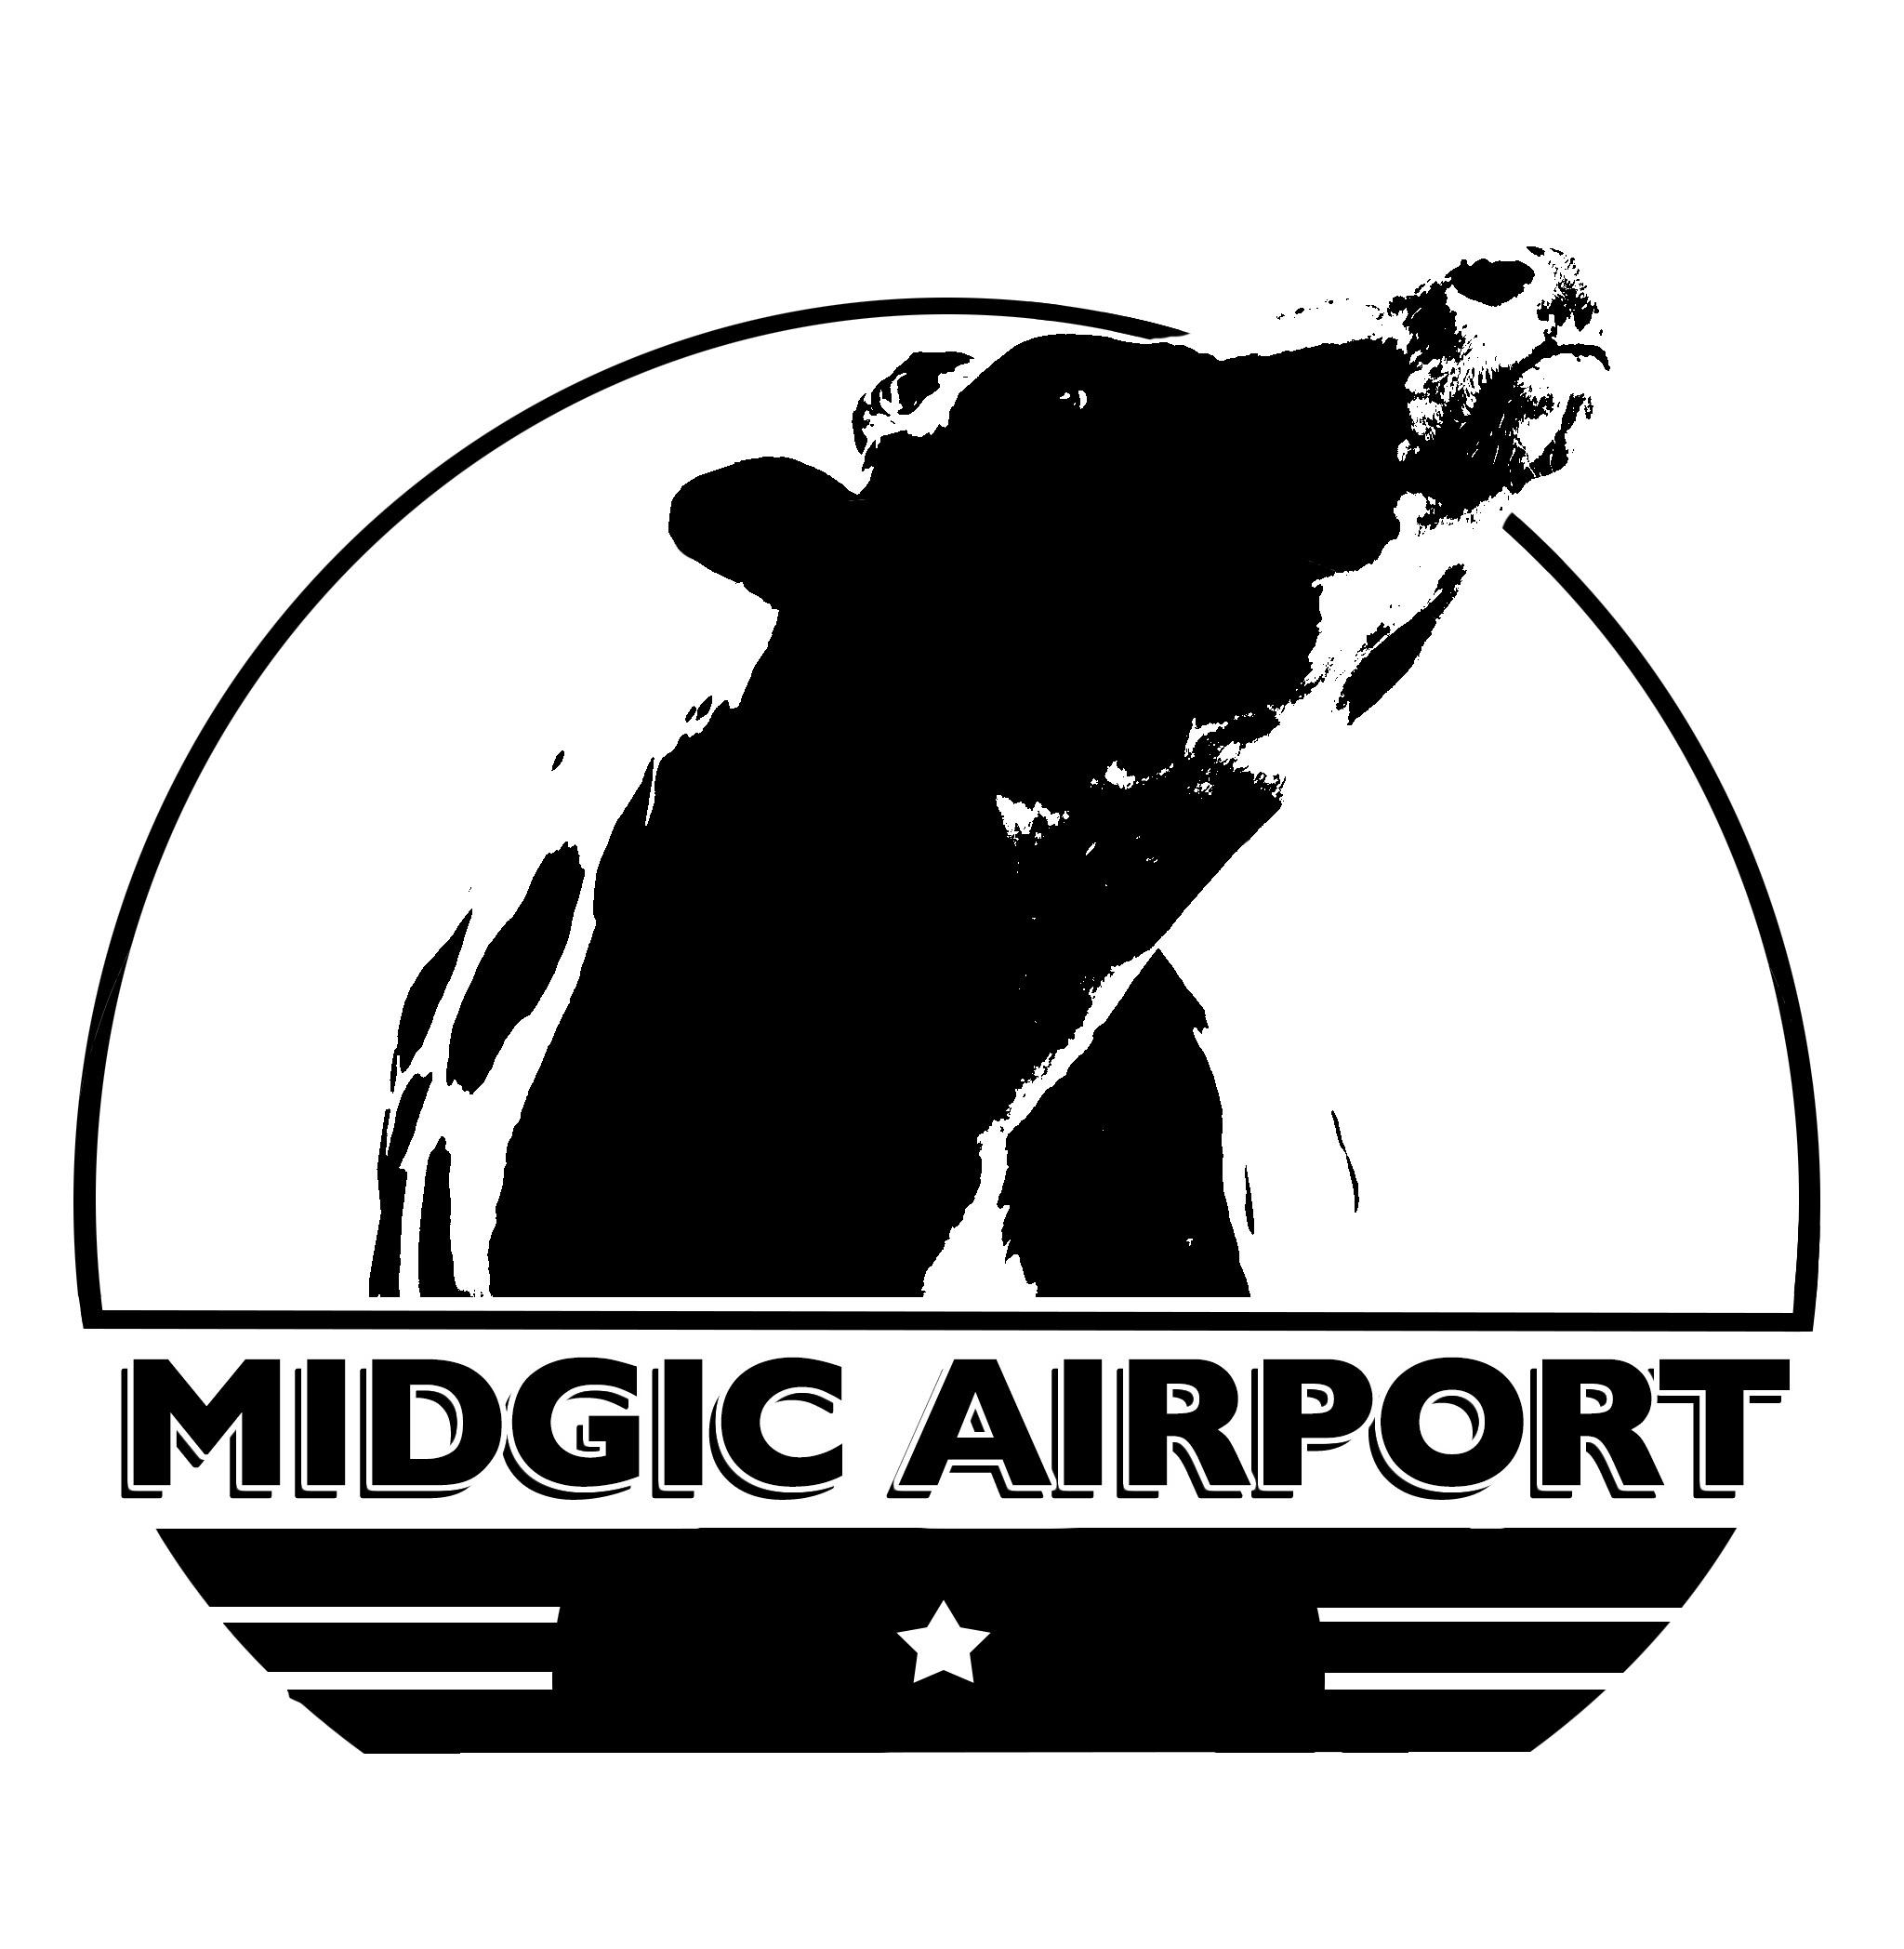 MIDGIC AIRPORT copy copy.jpg